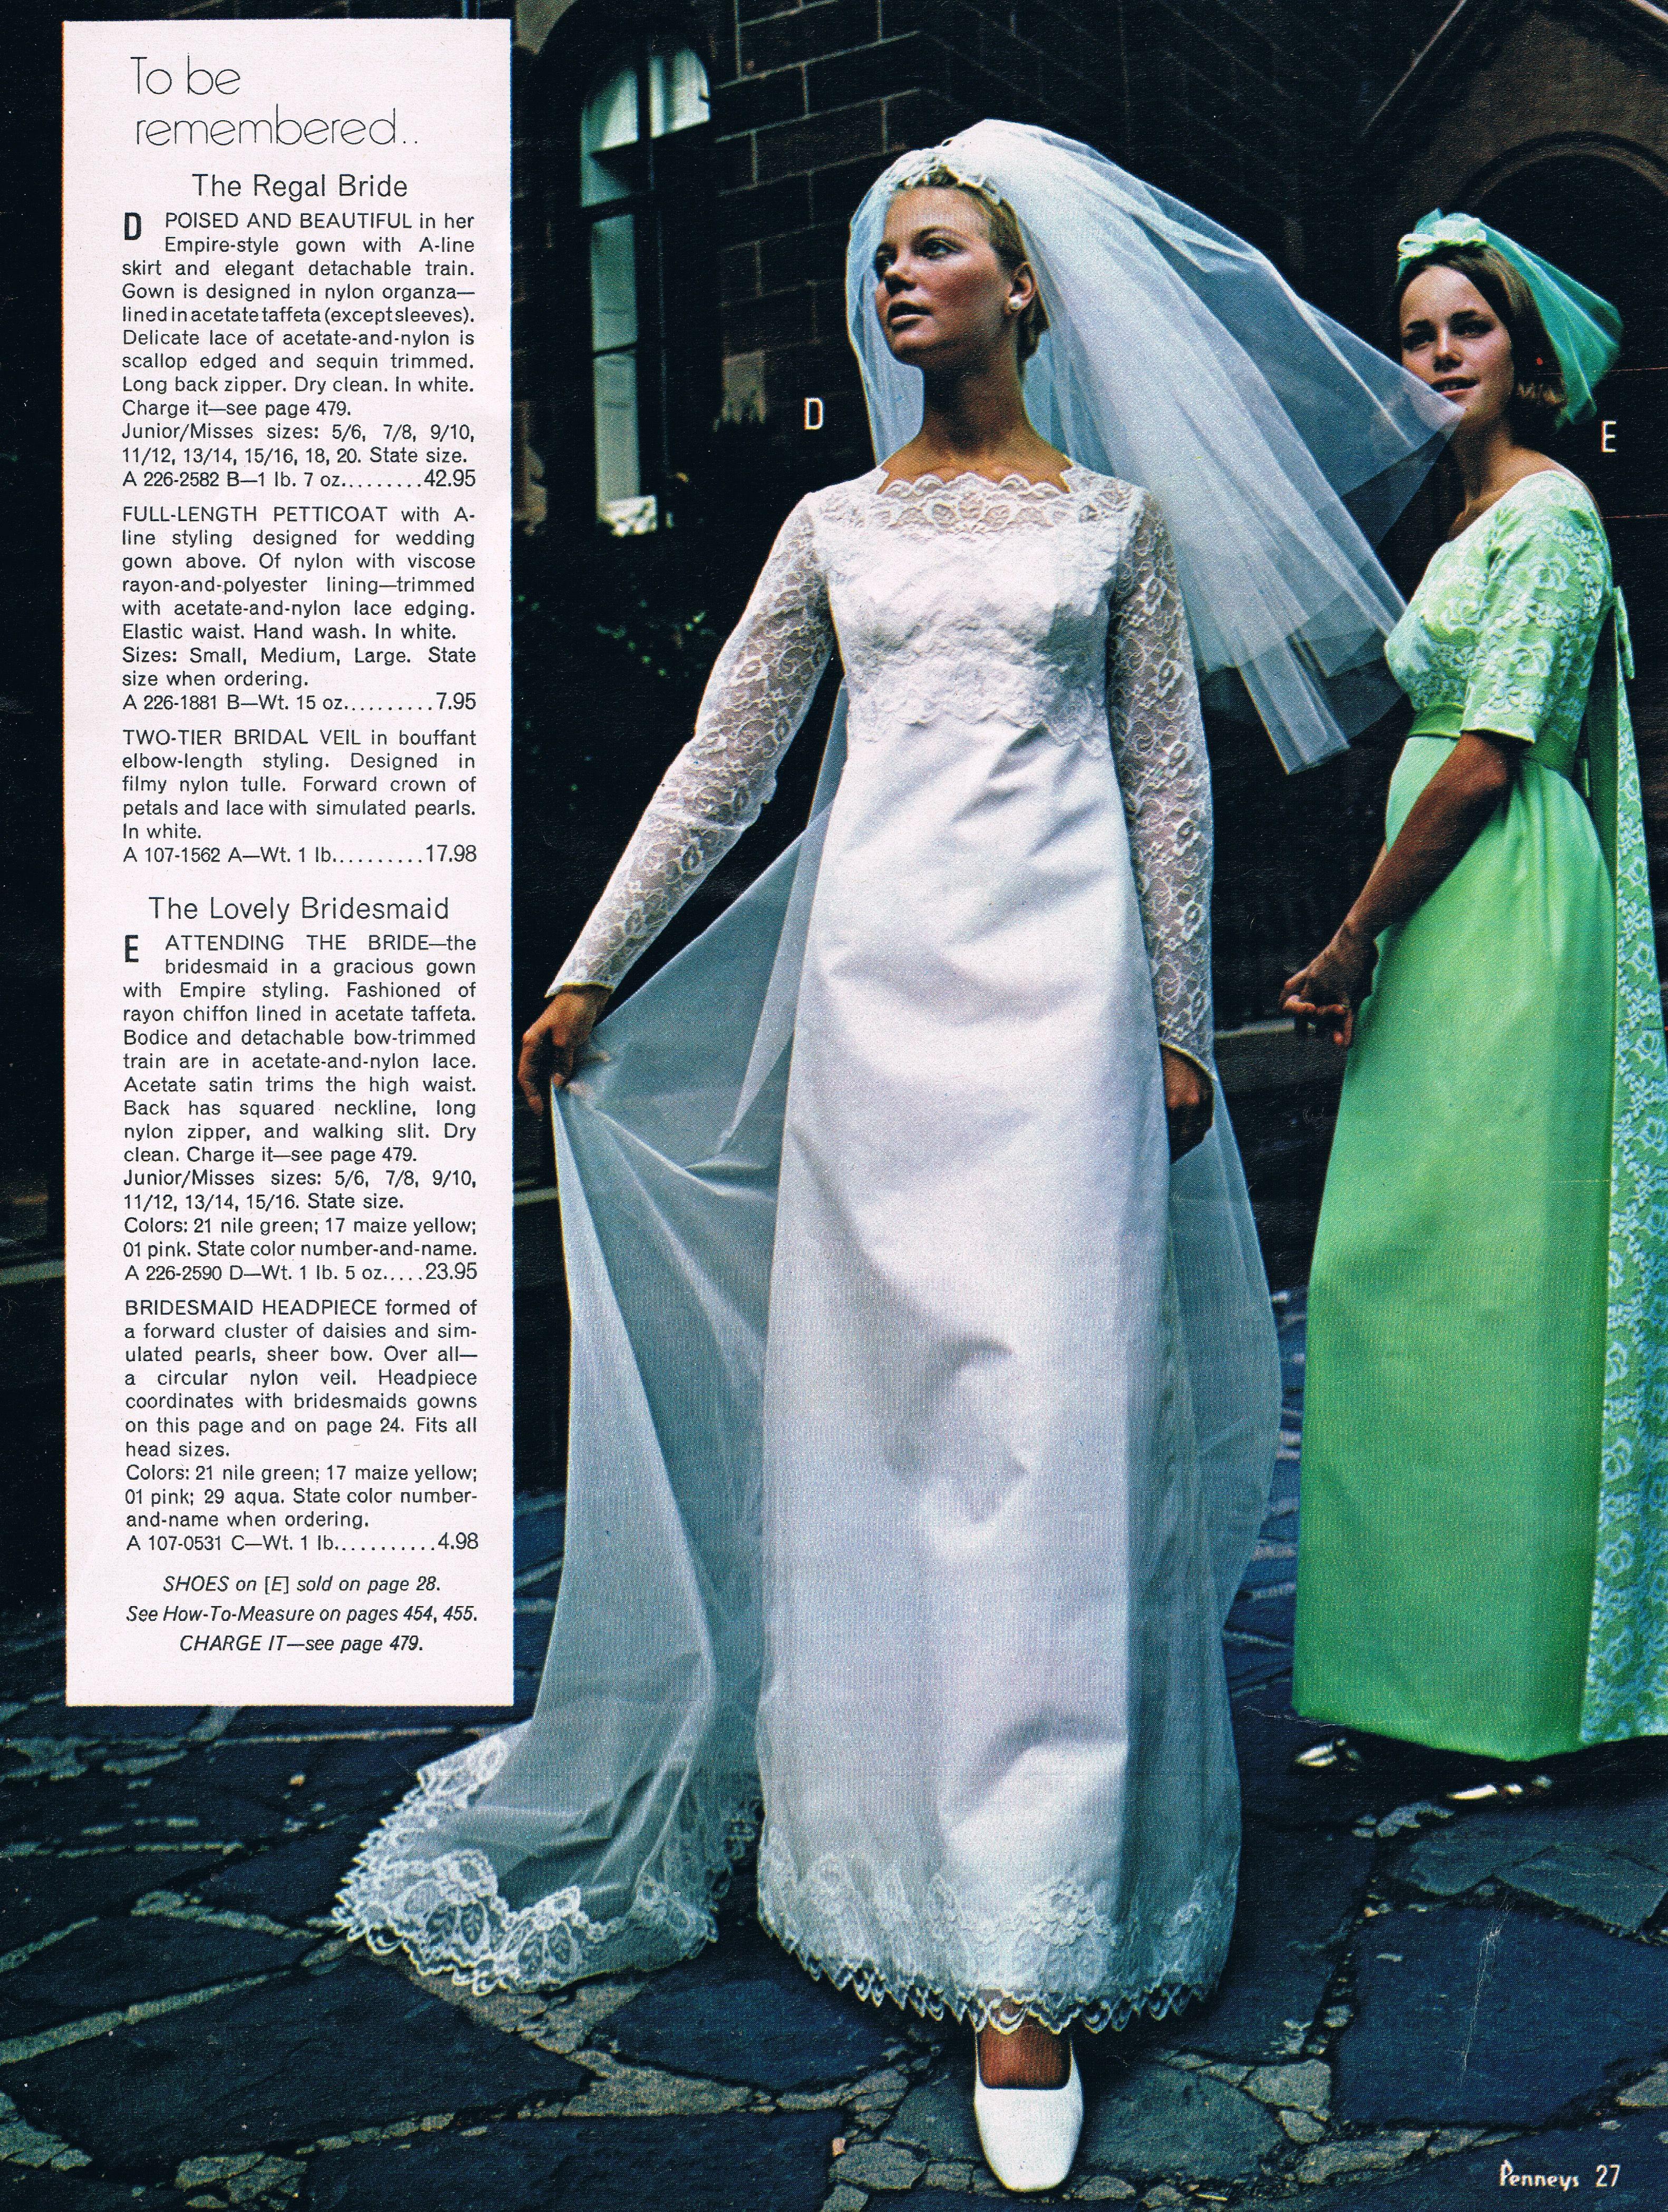 Penneys catalog 60s Lucy Angle bridesmaid | Cas\' wedding dress ...